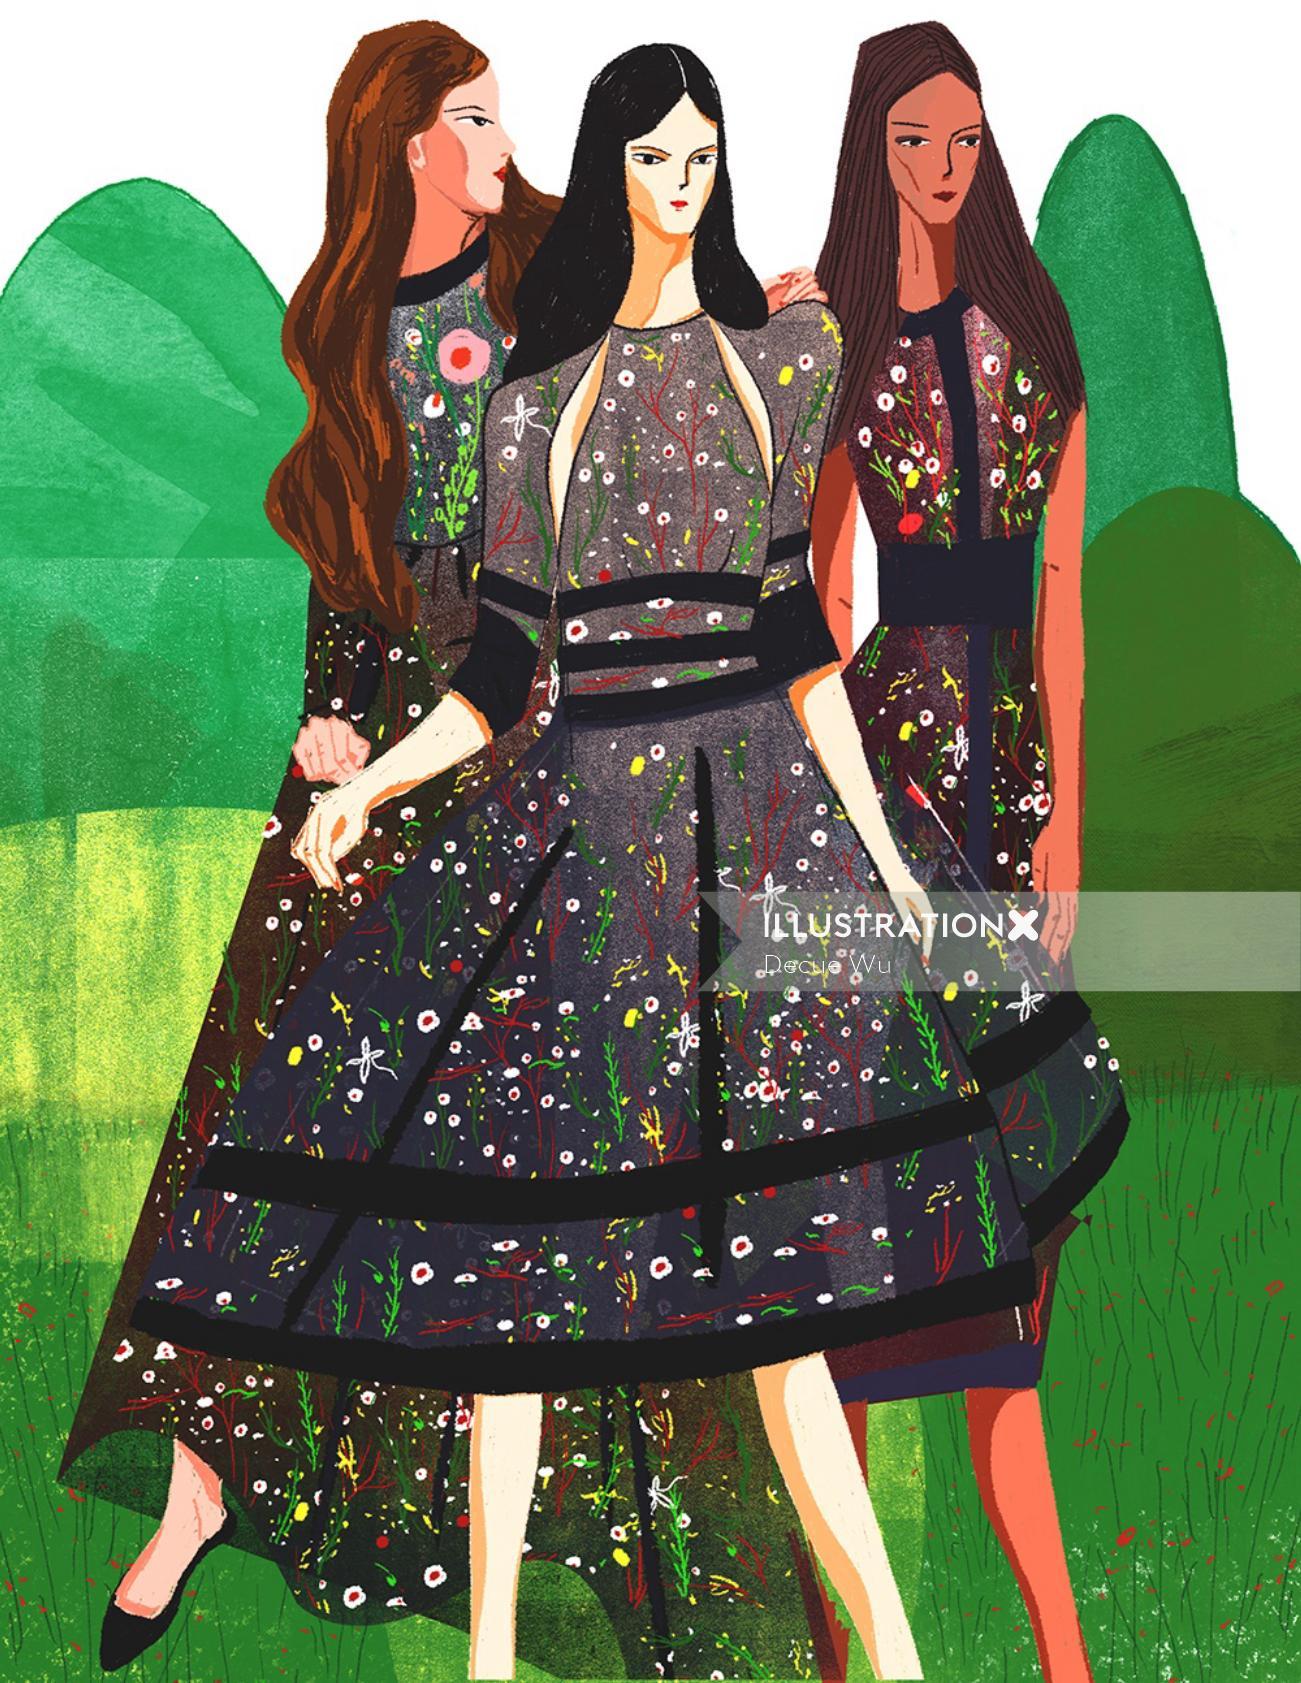 An illustration of women dressing